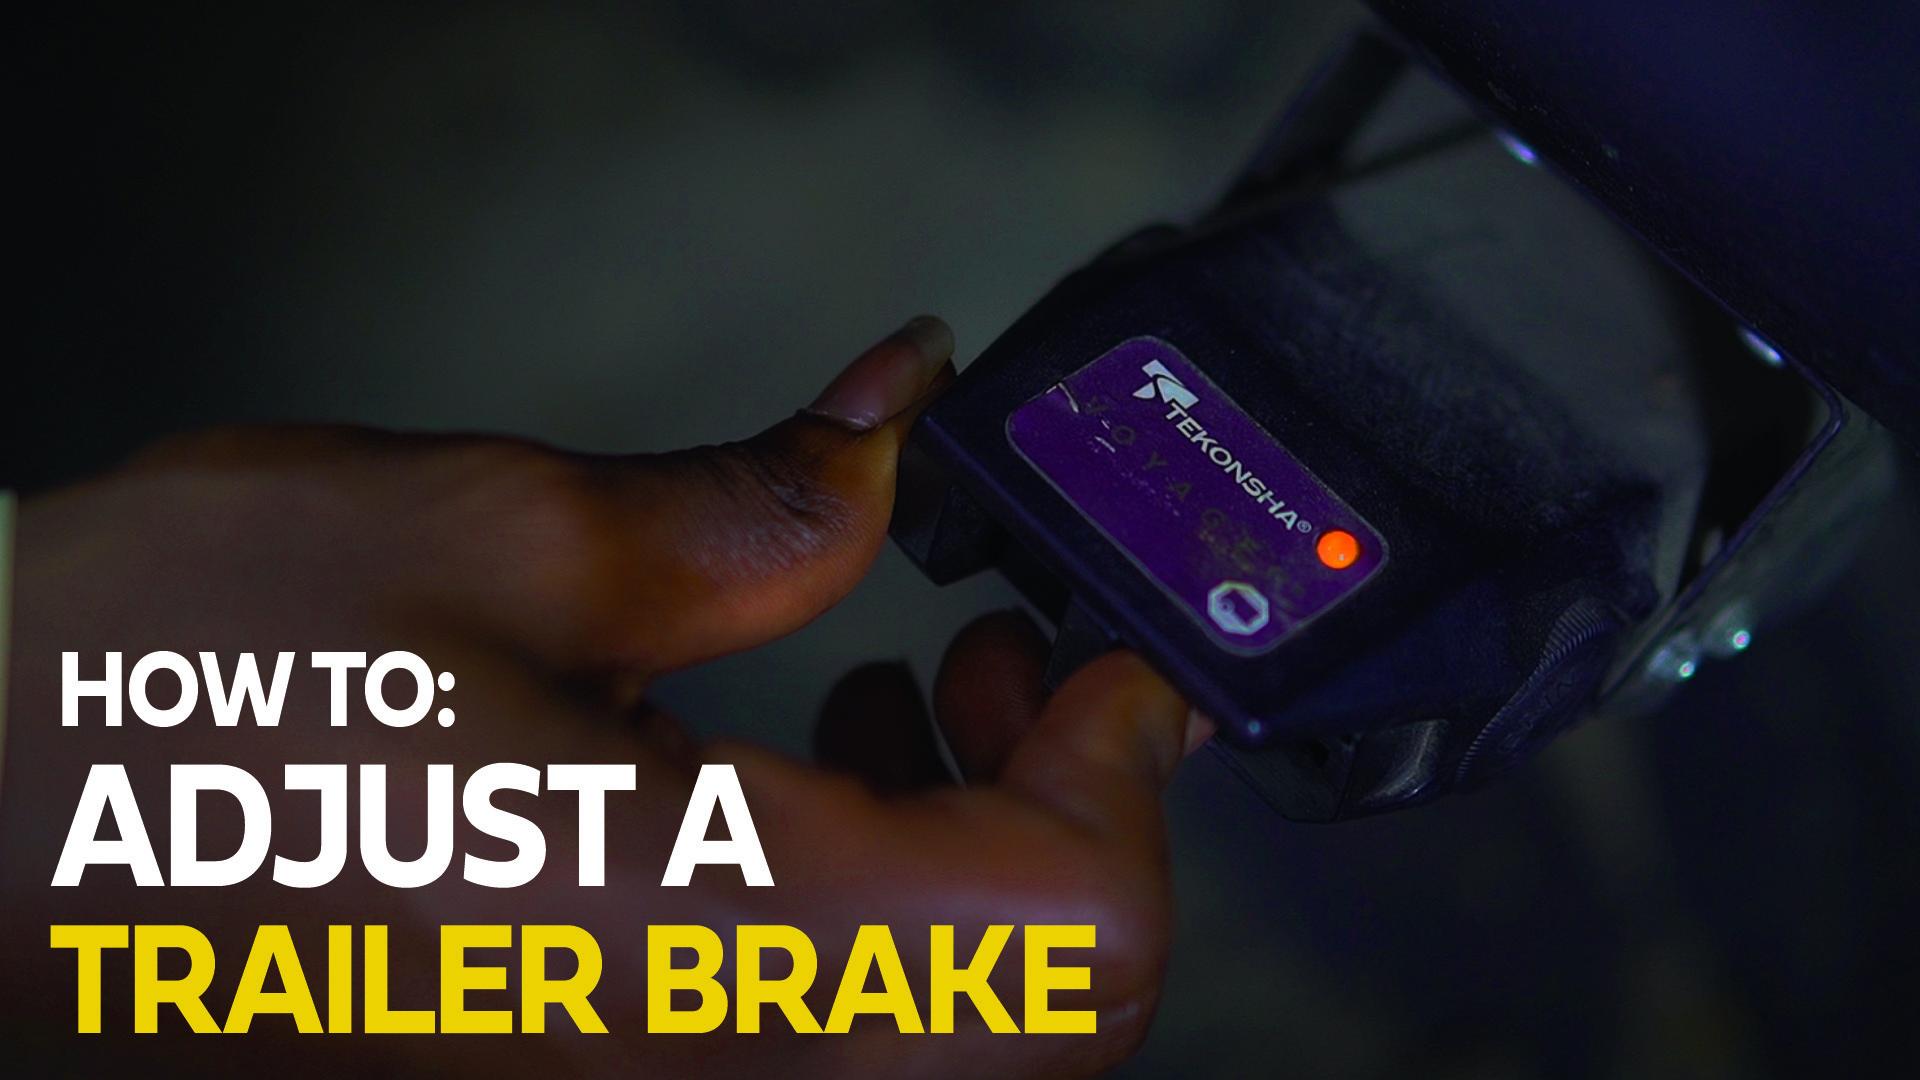 7. How to Adjust a Trailer Brake